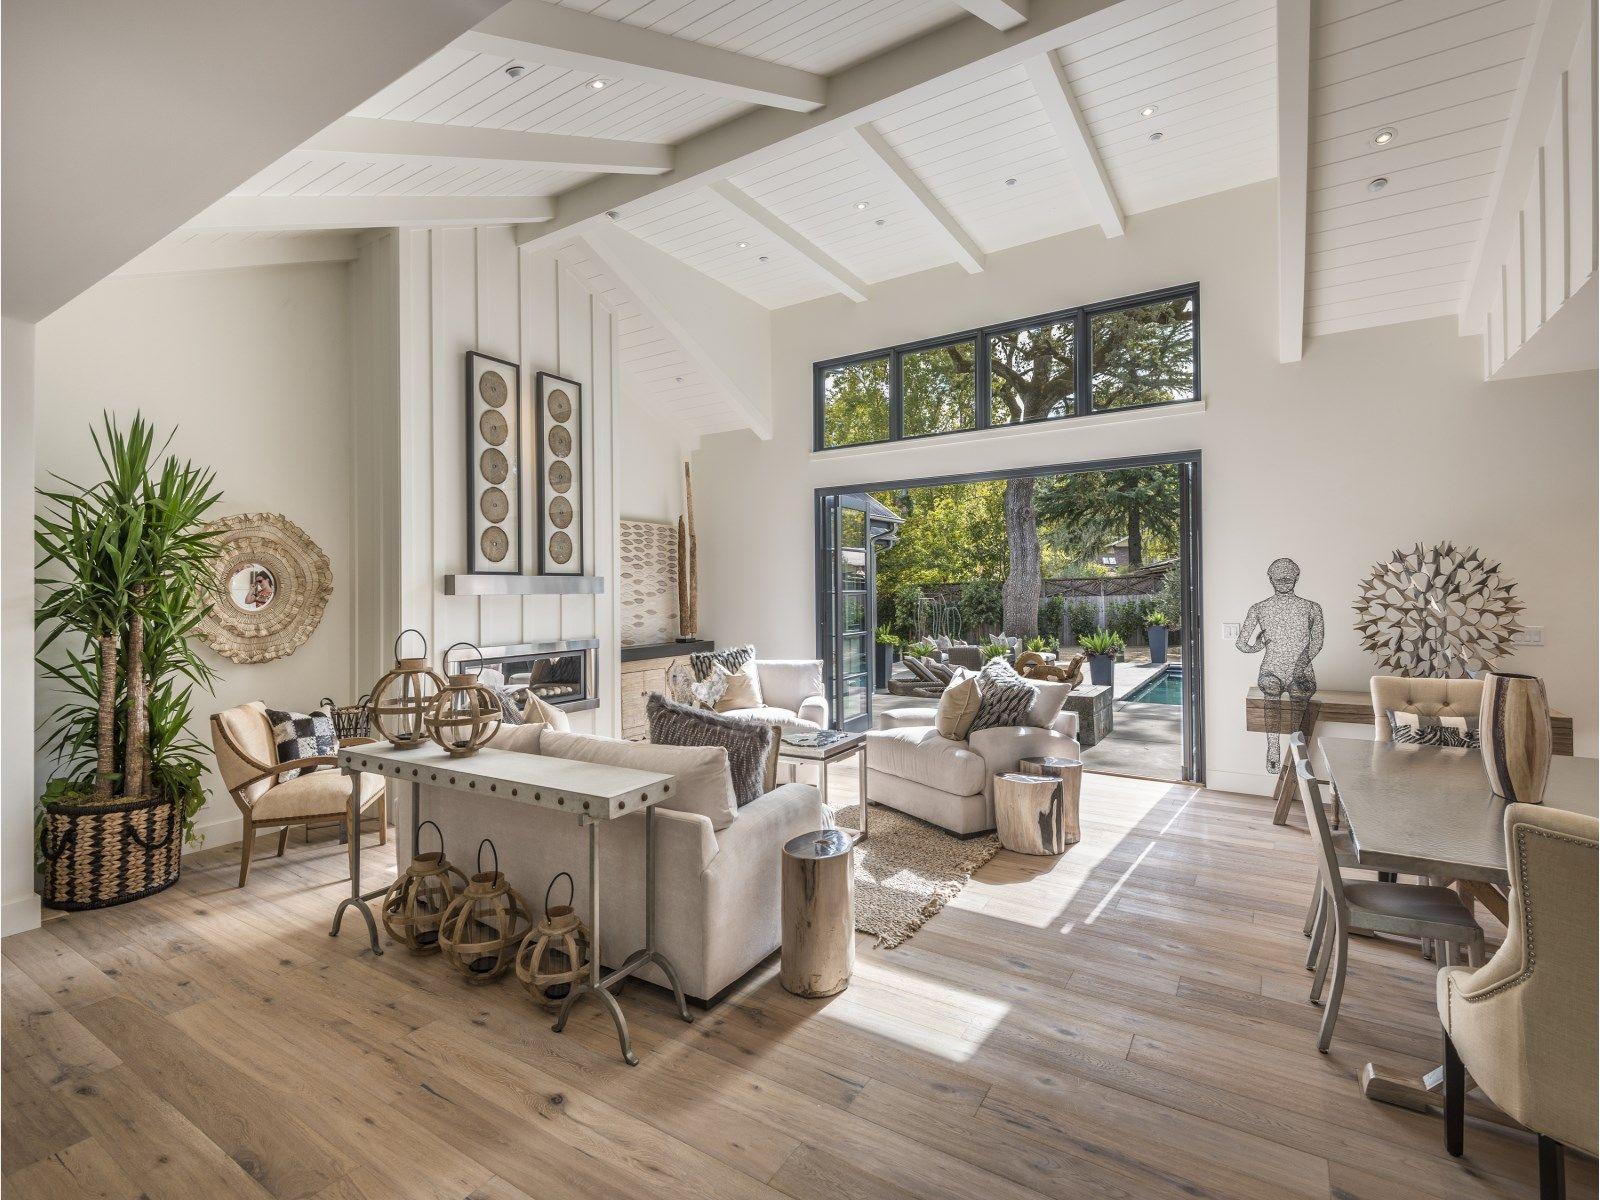 Cozy, modern farmhouse living room. Interior design by